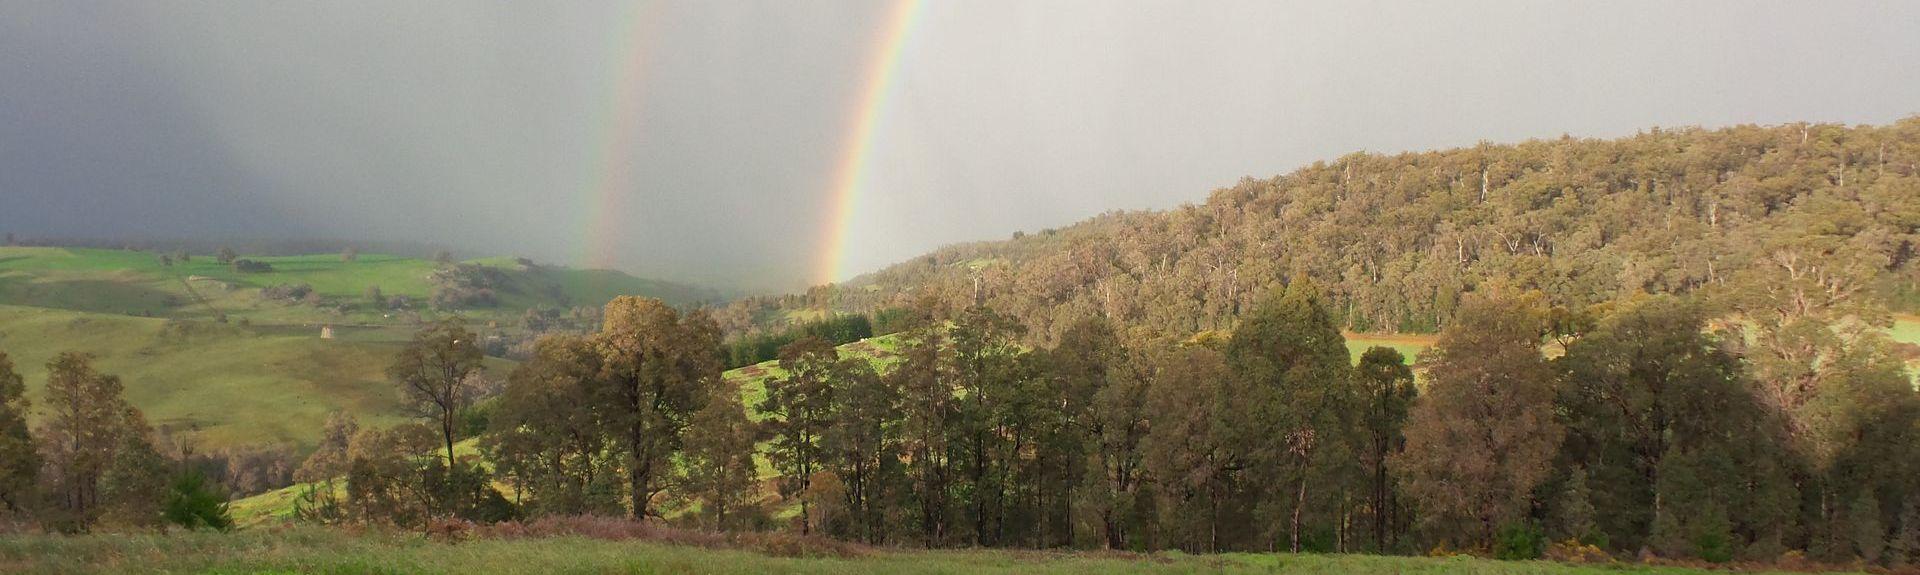 Donnelly River, Australie-Occidentale, Australie